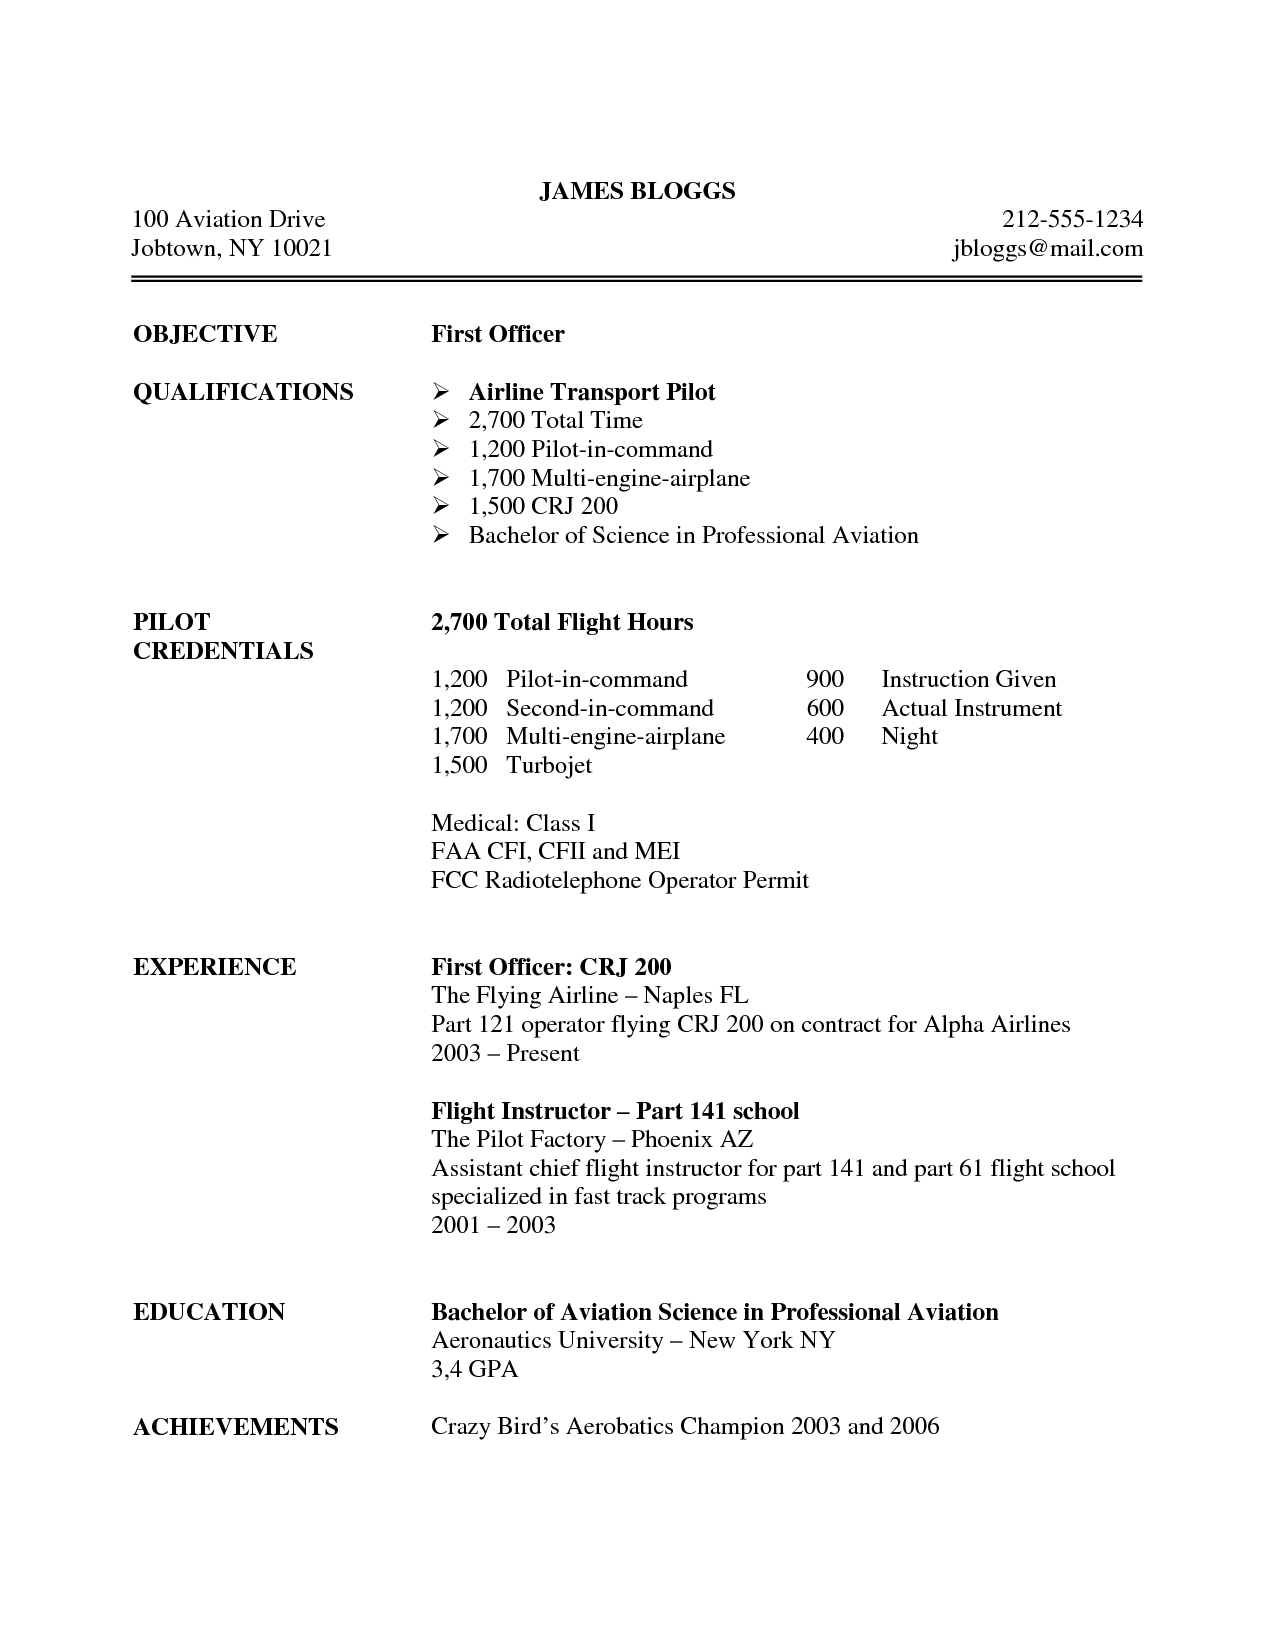 Professional Pilot Resume Professional Pilot Resume